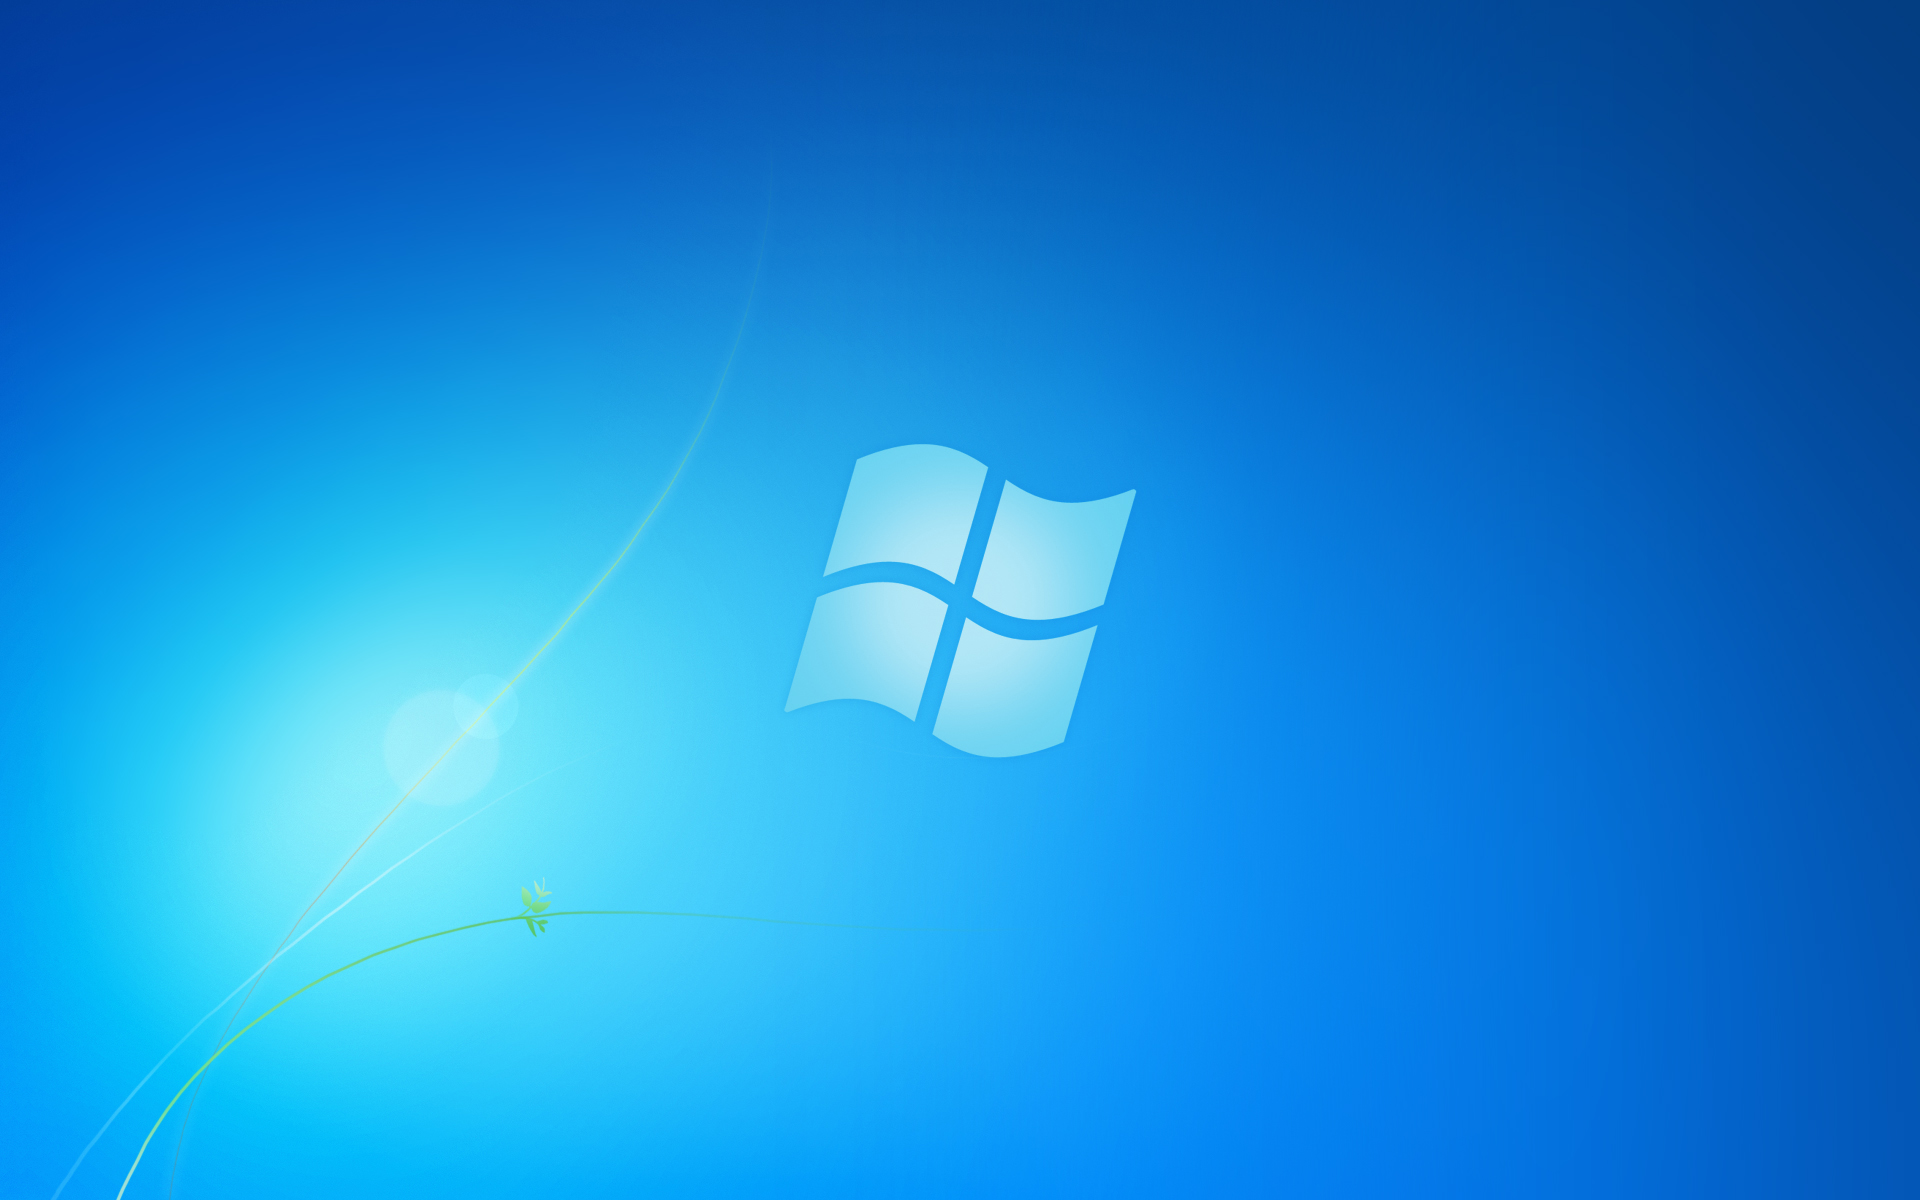 Download Windows 7 Starter Wallpaper Original 1920x1200